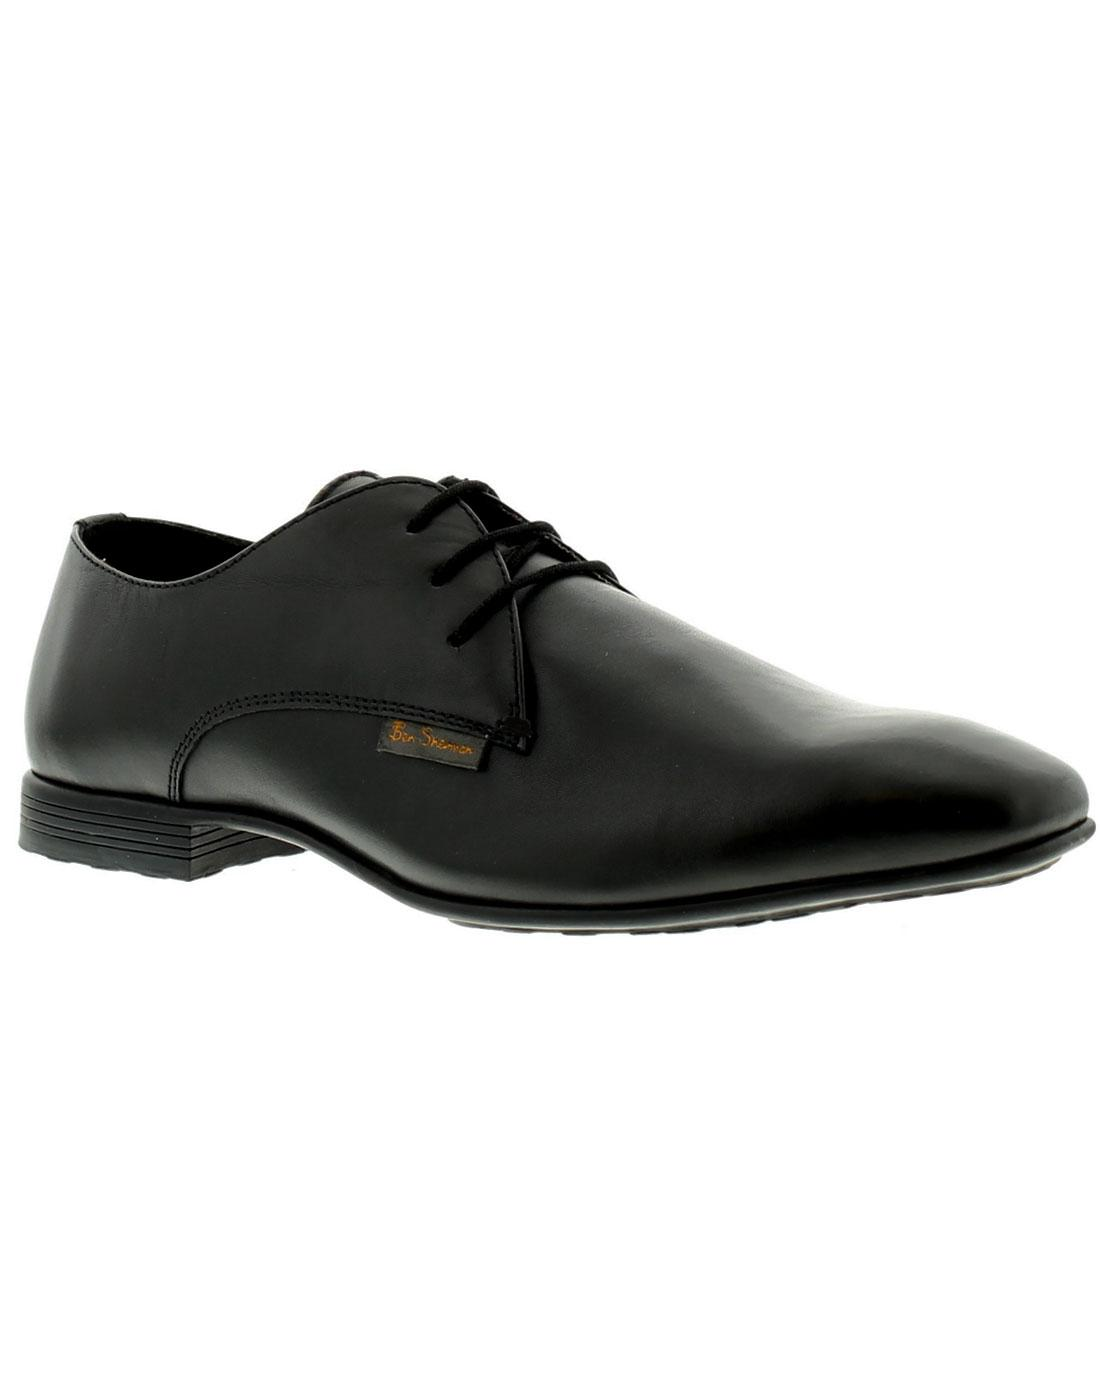 Adair BEN SHERMAN 60s Mod Lace Up Formal Shoes (B)